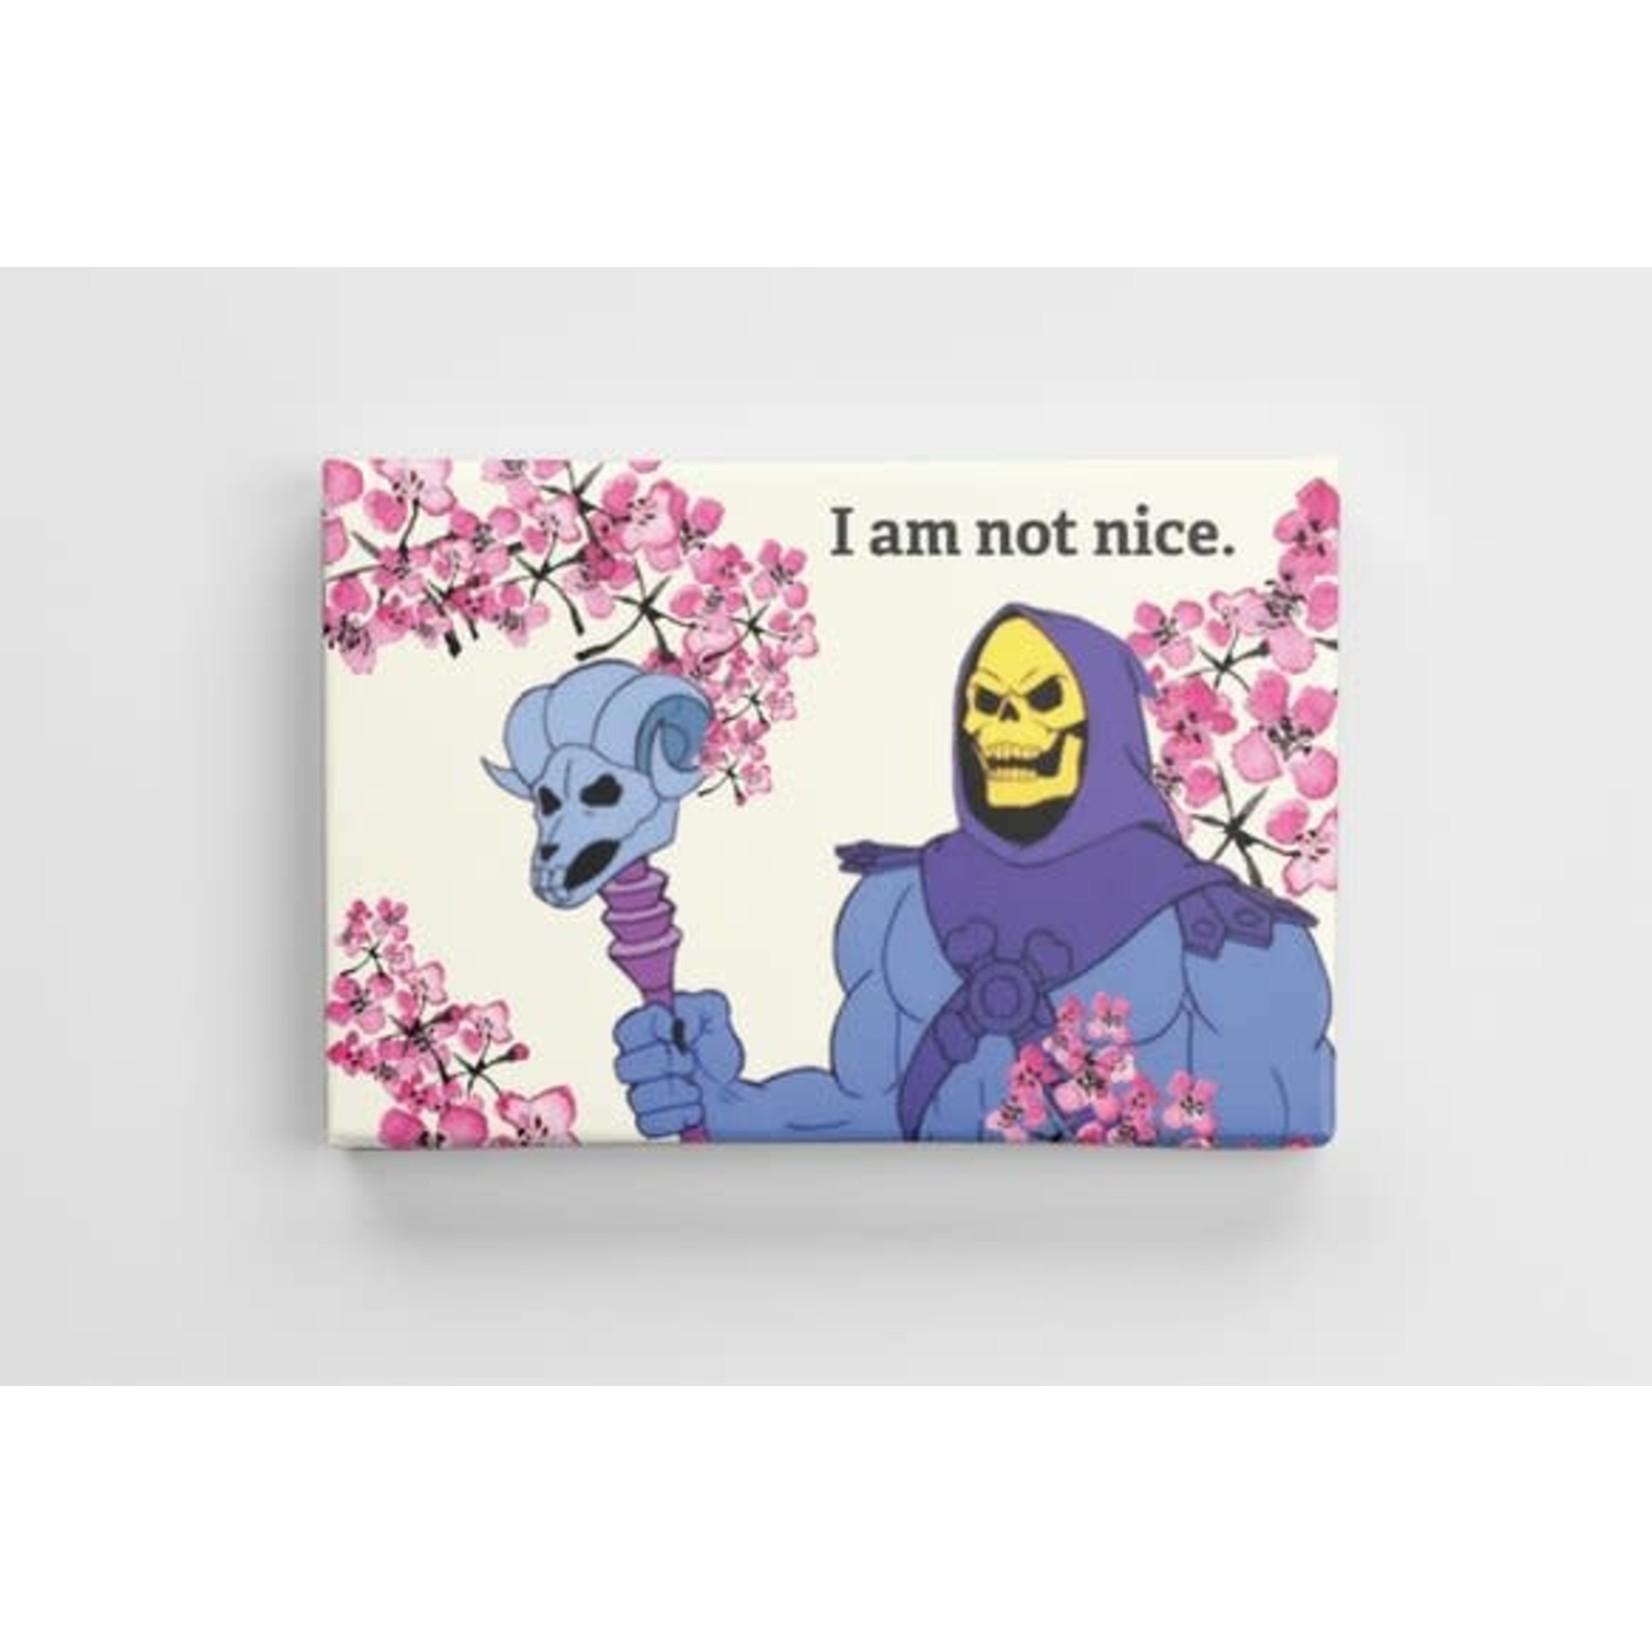 Bad Annie's Skeletor Art - I Am Not Nice